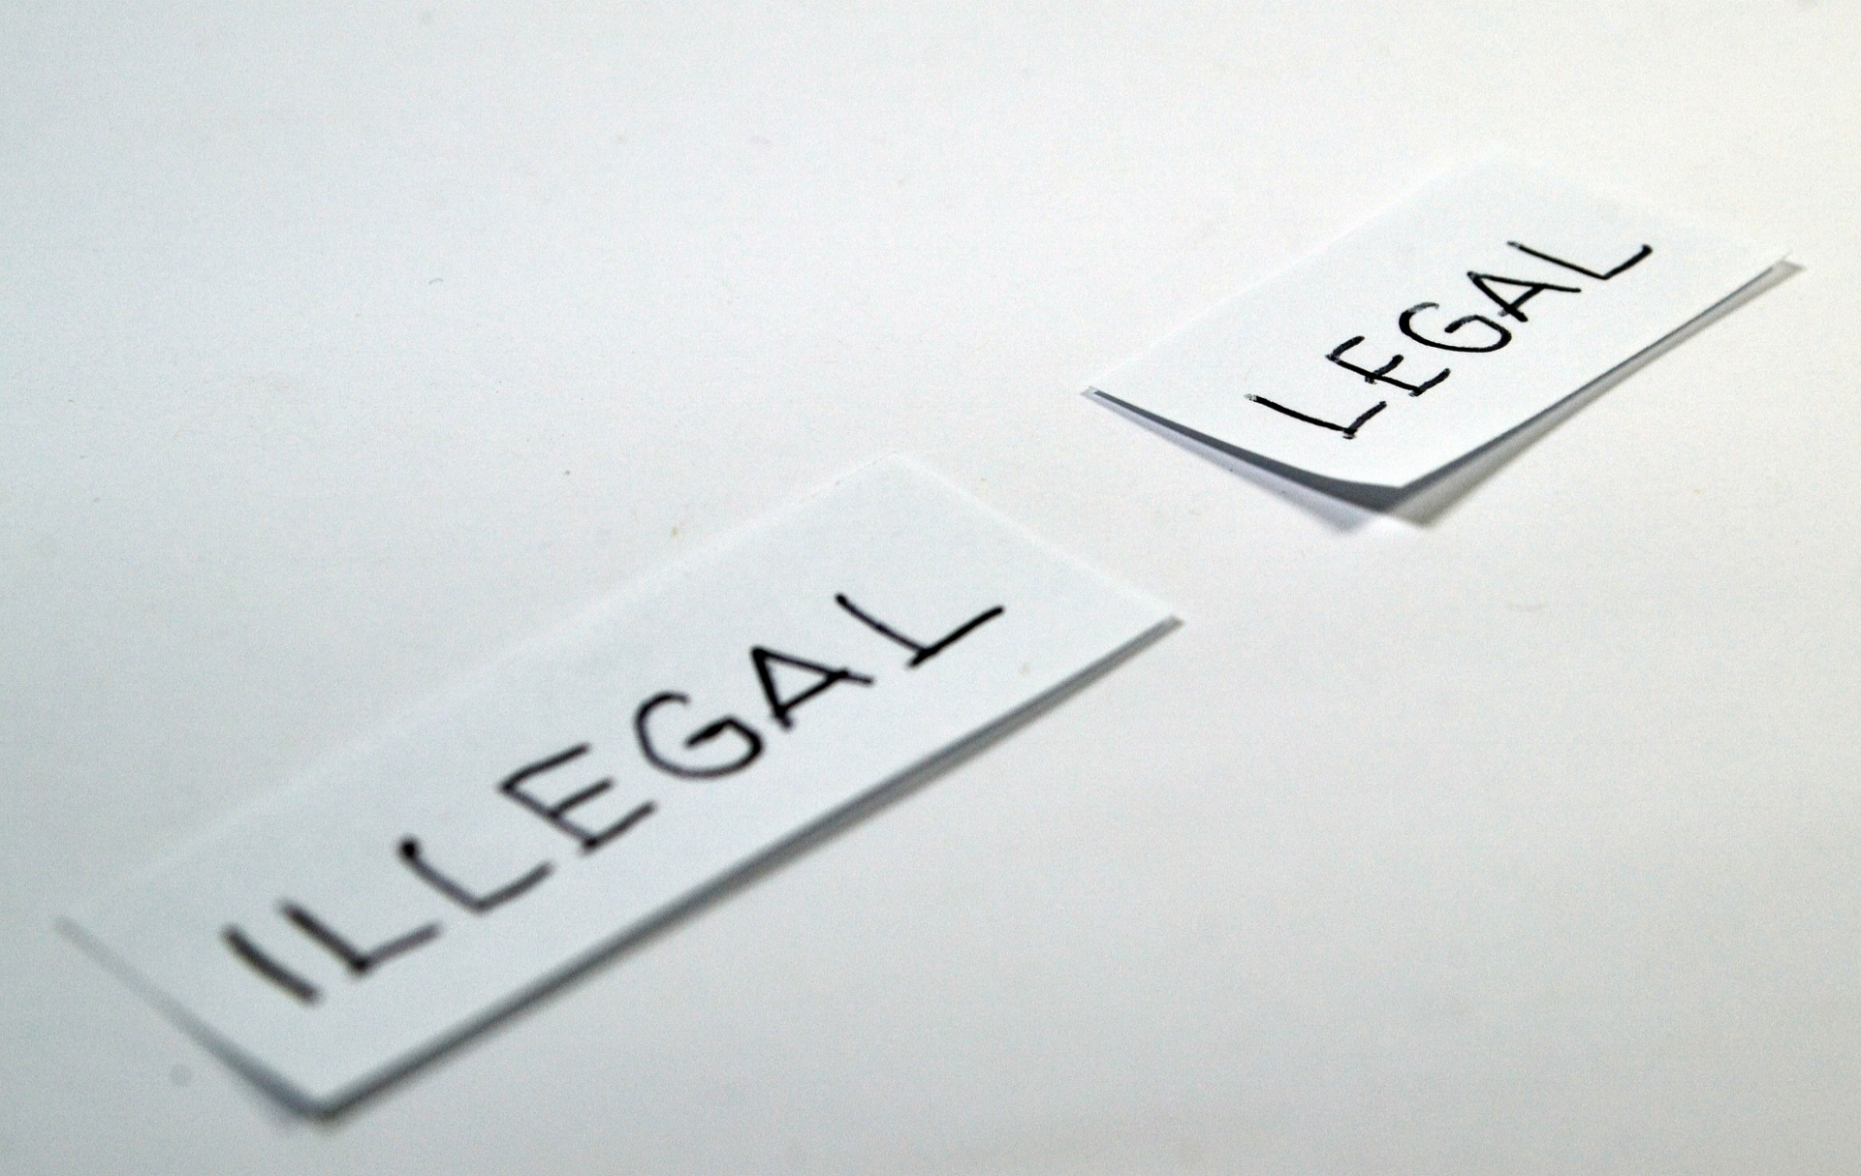 legal-1143115_1920.jpg